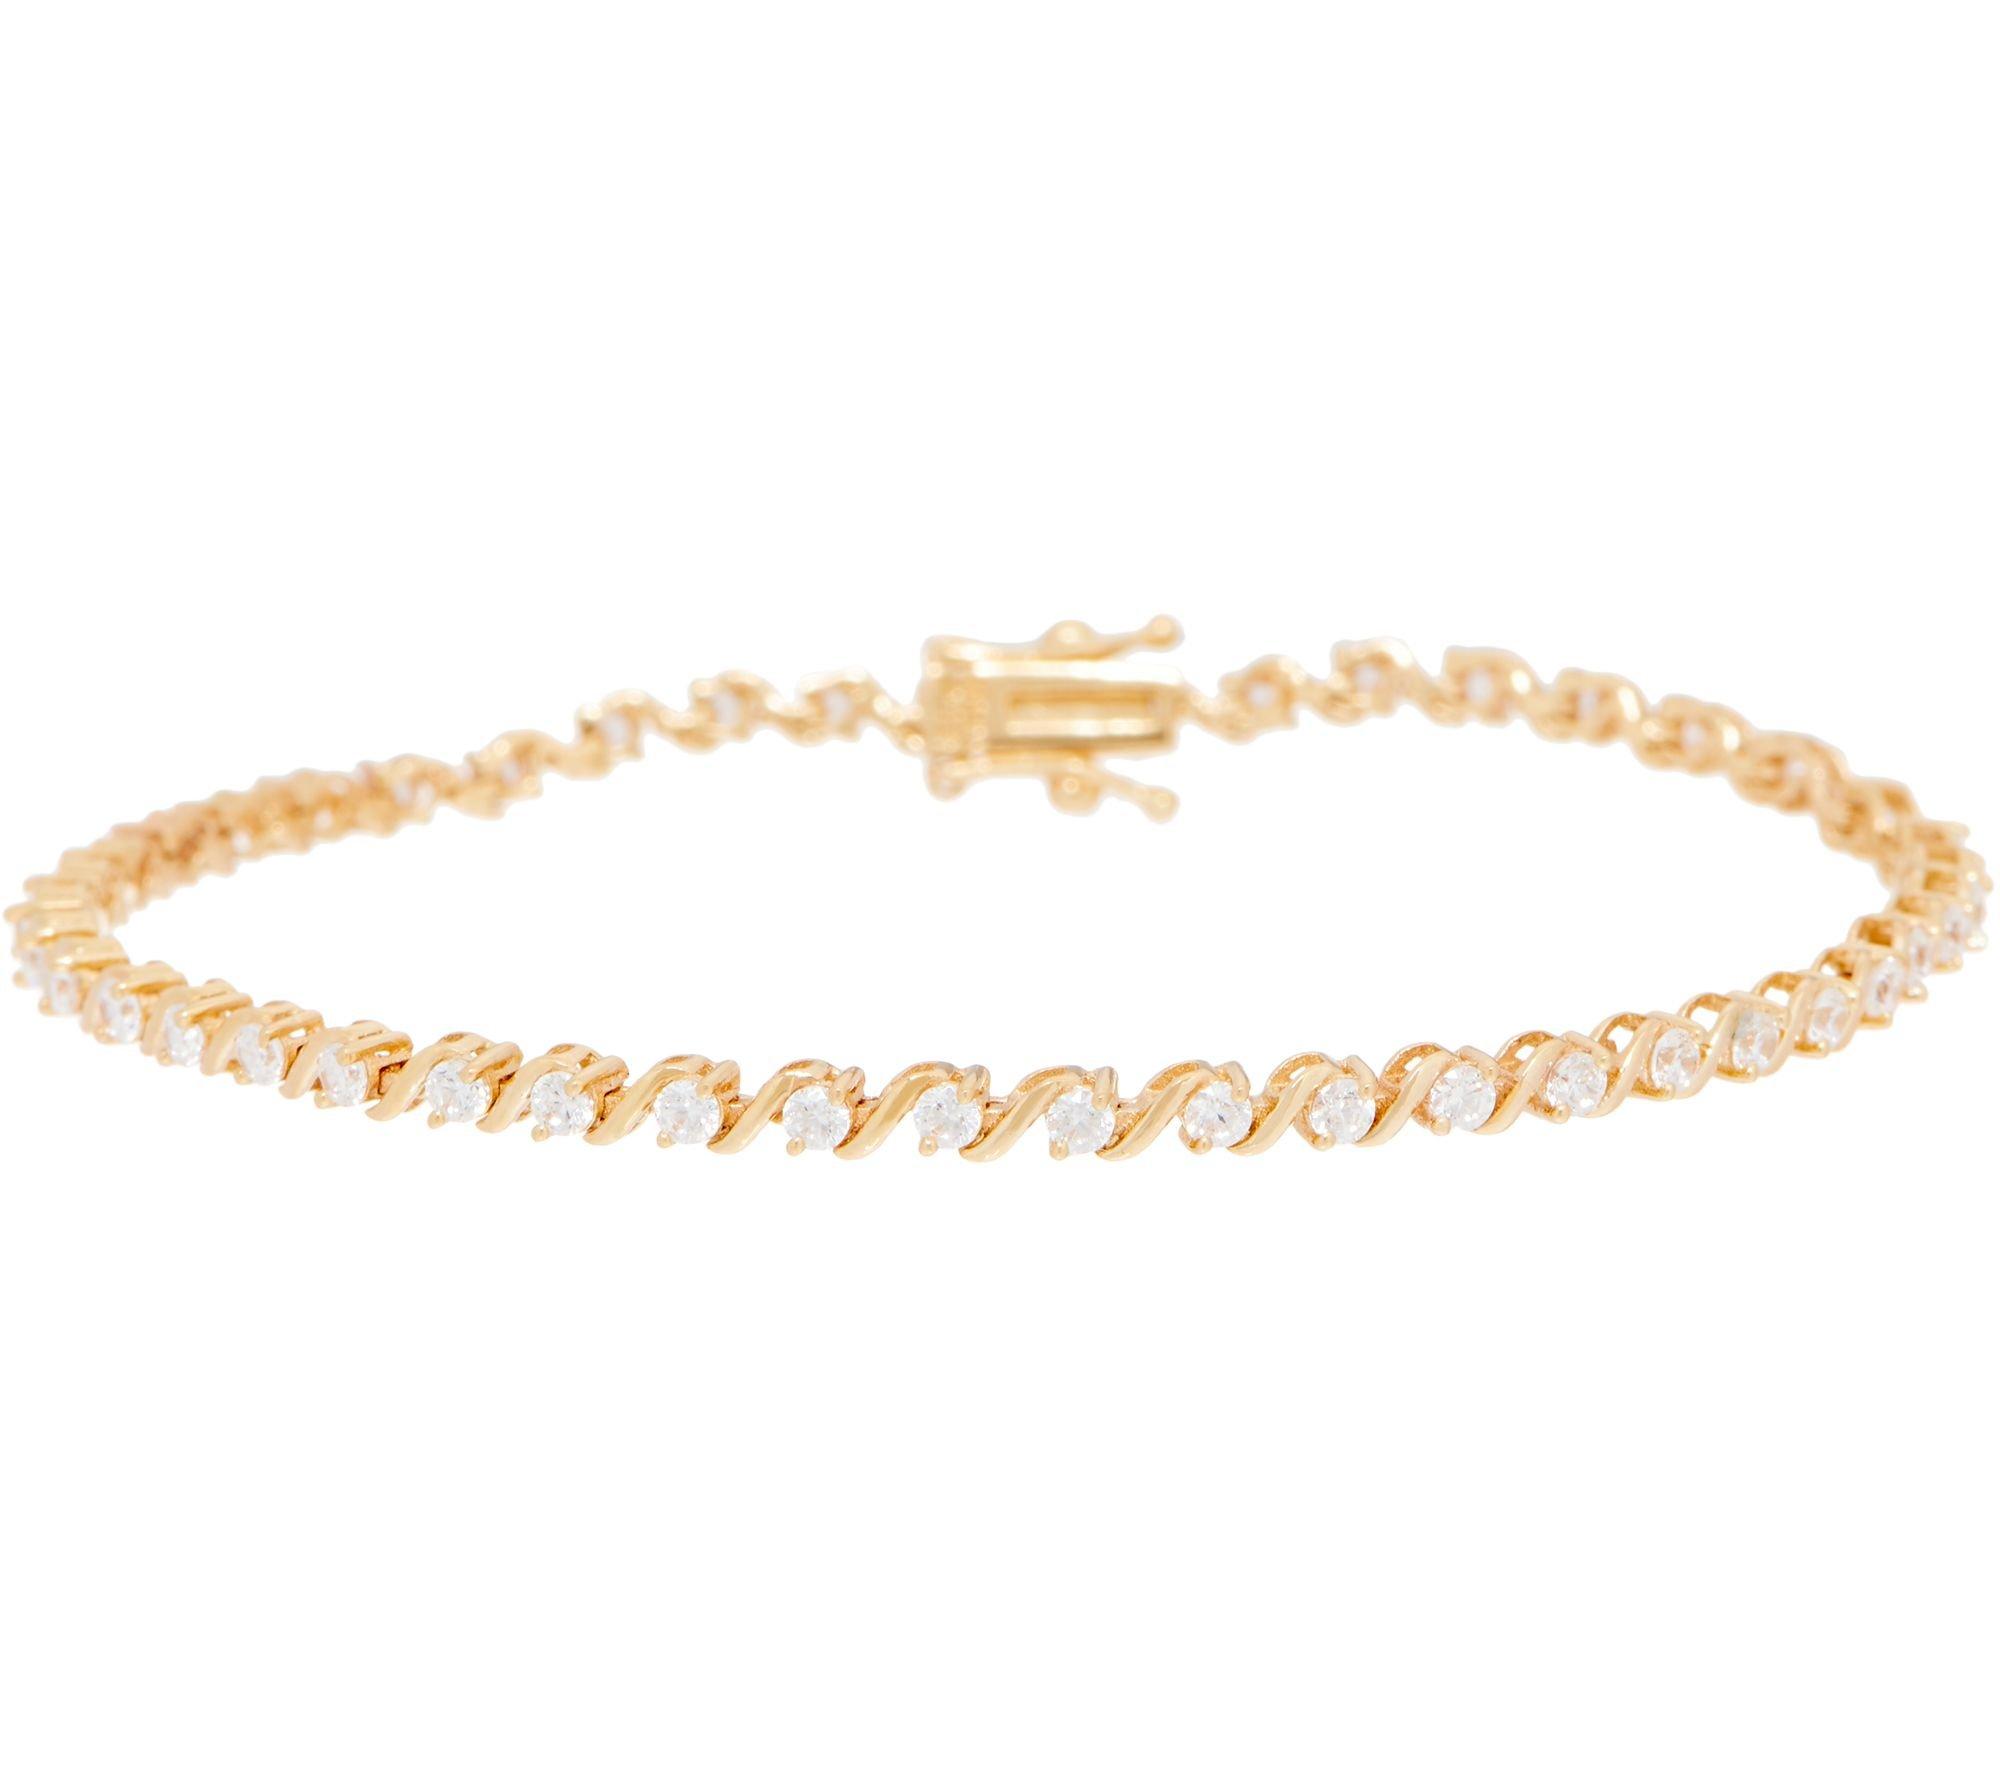 Silvercz Jewels 1.00 Carat Round Cut D/VVS1 Diamond S-Bar Tennis Bracelet In 14K Yellow Gold Plated by Silvercz Jewels